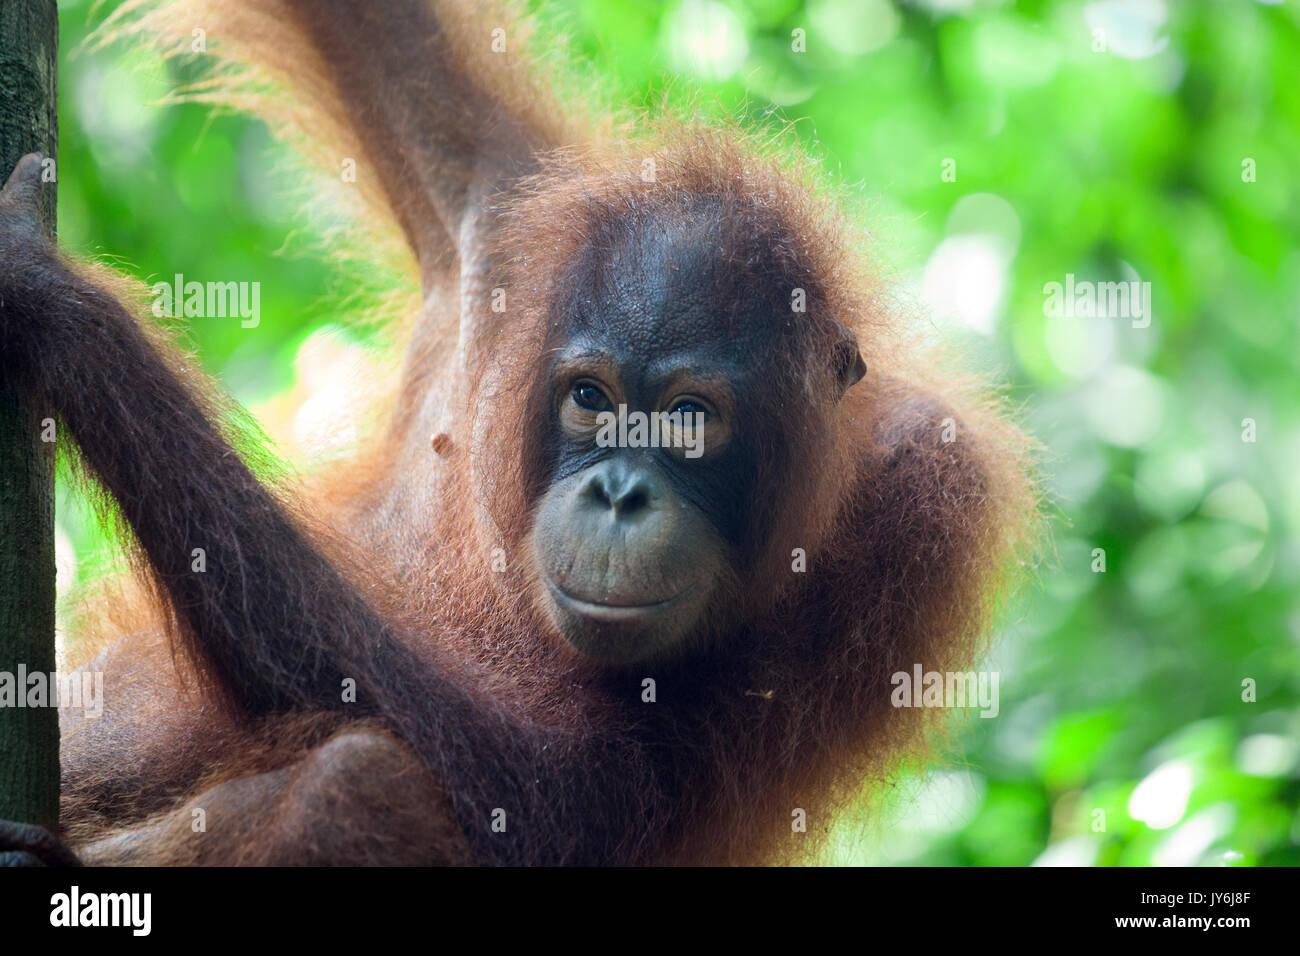 Orangutan (Pongo pygmaeus) in tree, Sepilok Forest Reserve, Sabah, Borneo, Malaysia Stock Photo